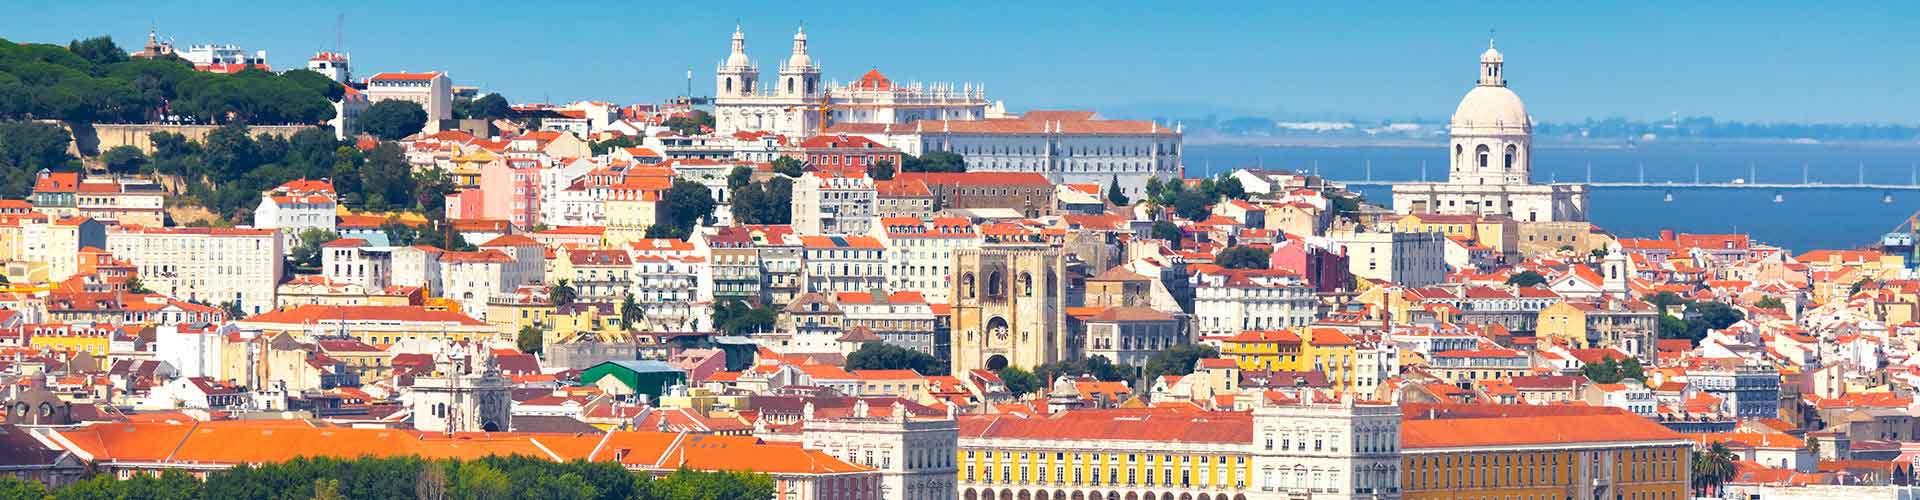 Lisboa - Albergues Juveniles en Lisboa. Mapas de Lisboa, Fotos y Comentarios para cada Albergue Juvenil en Lisboa.